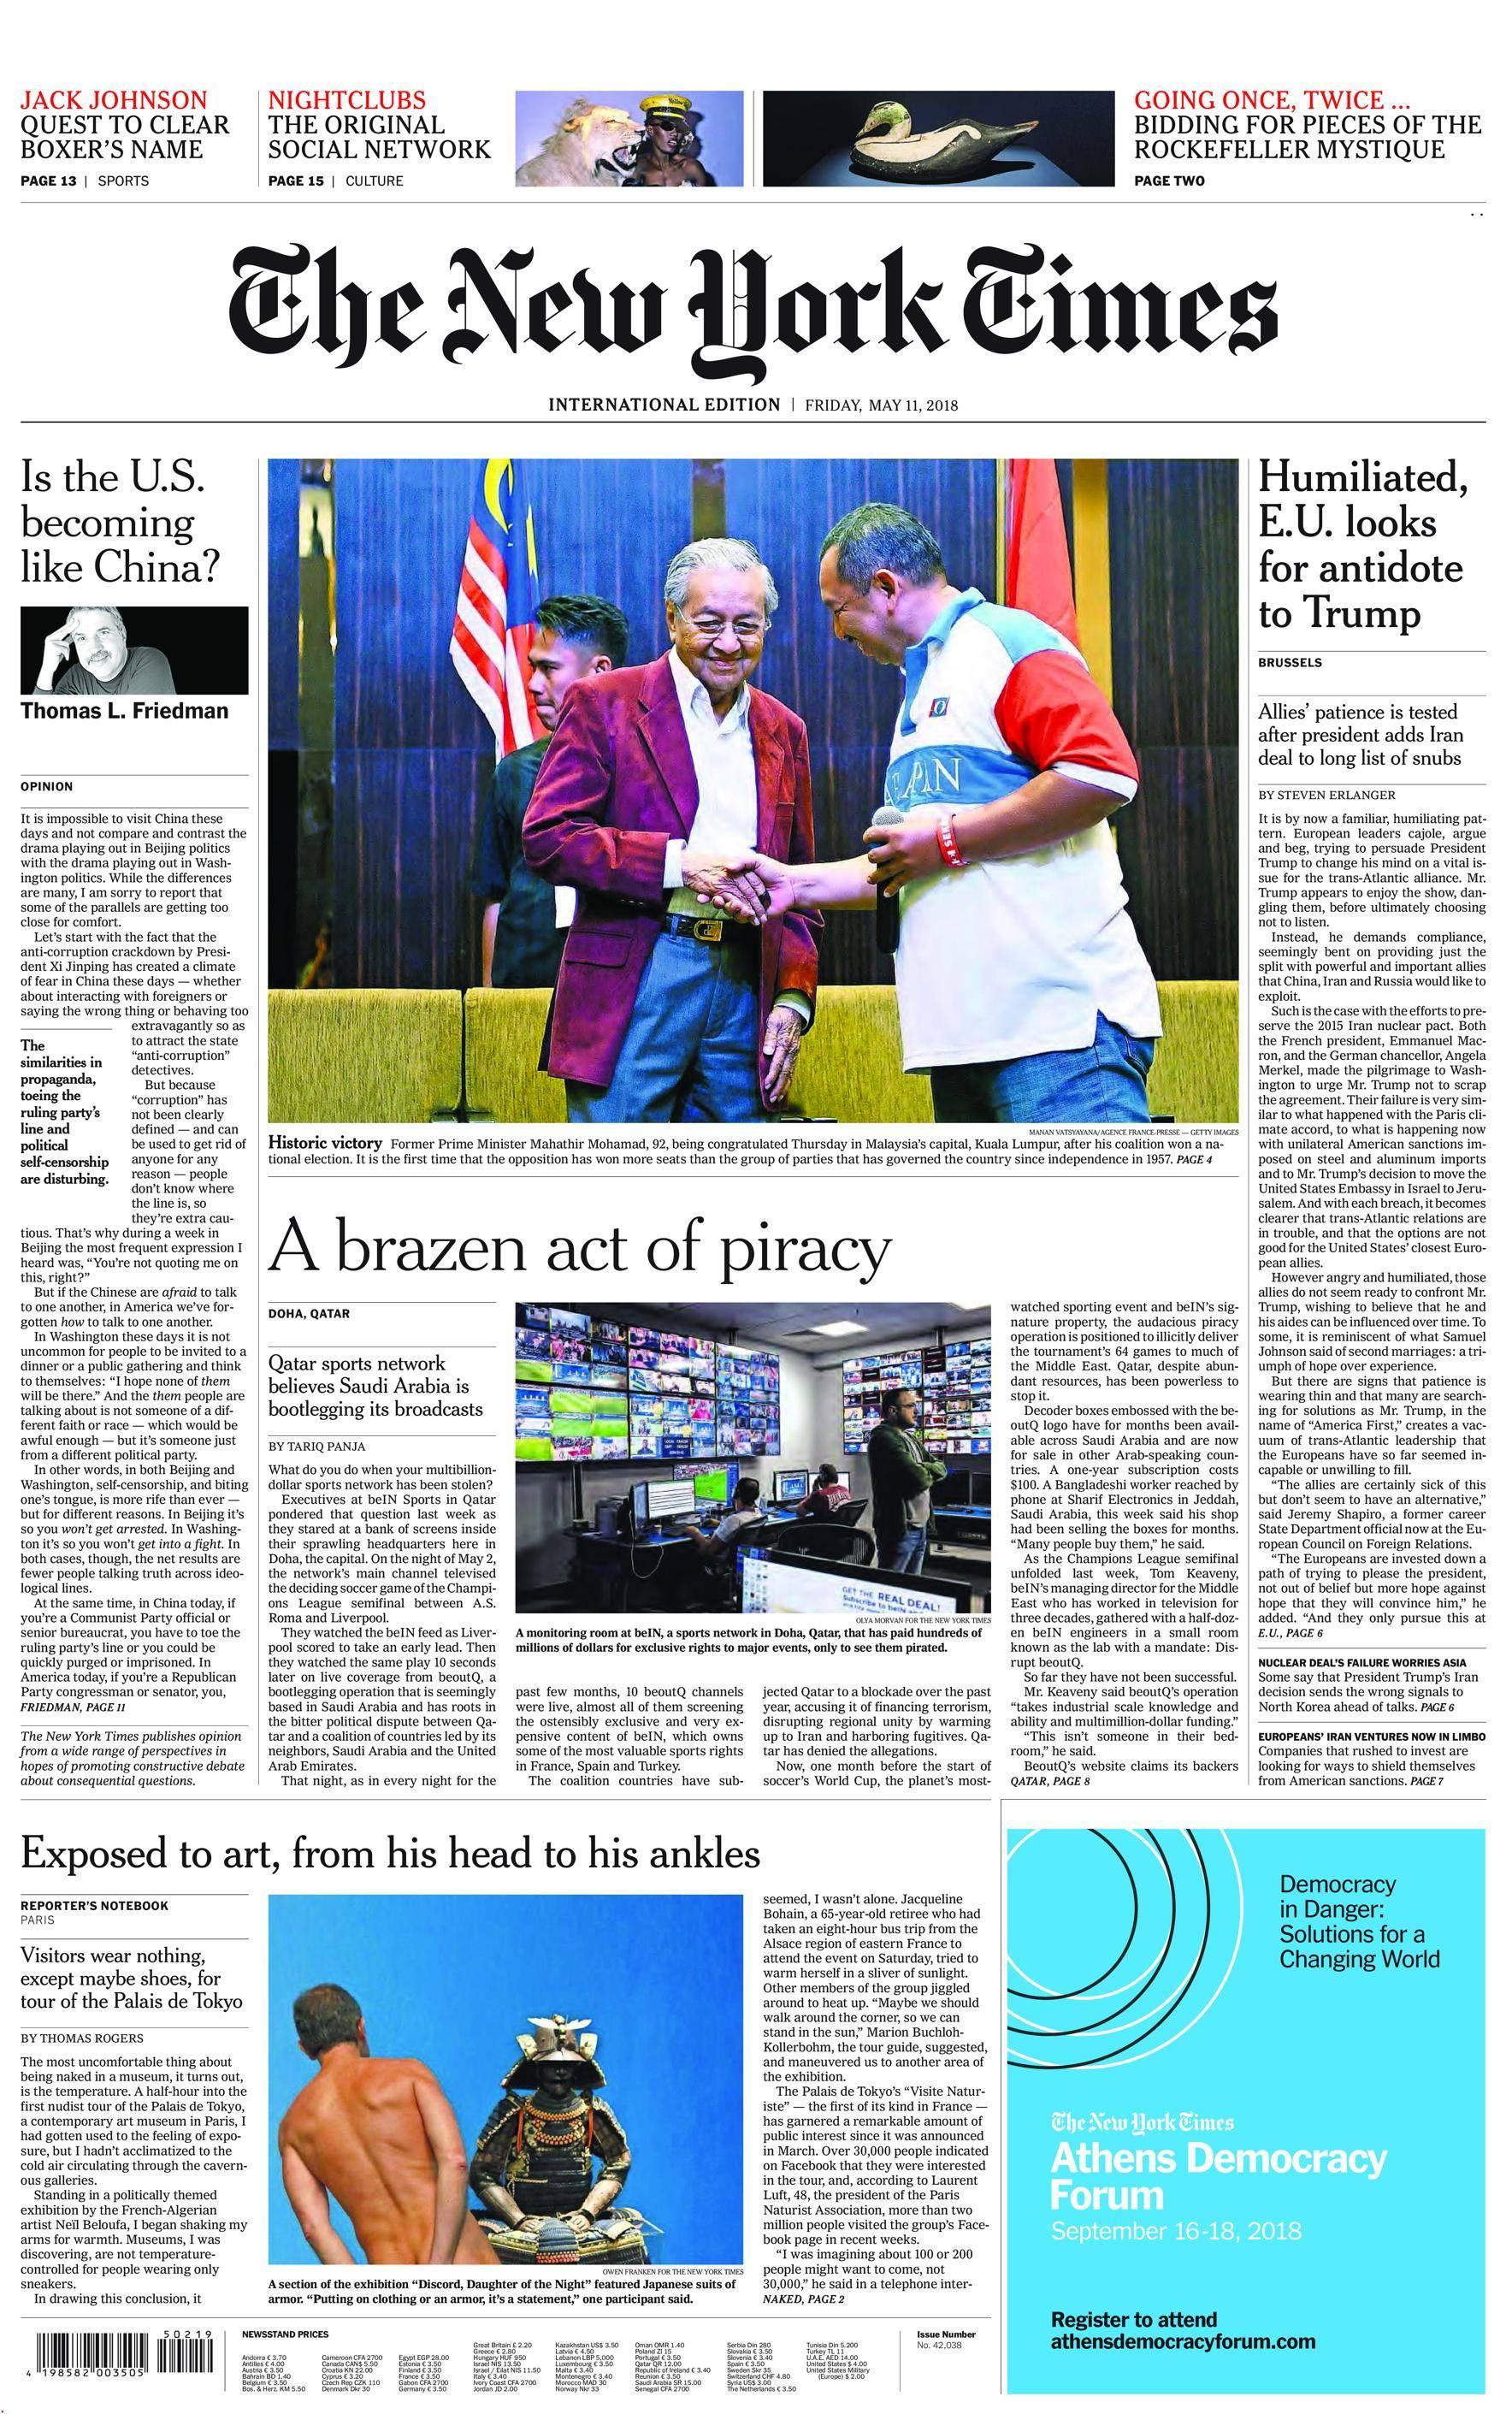 International New York Times - 11 May 2018